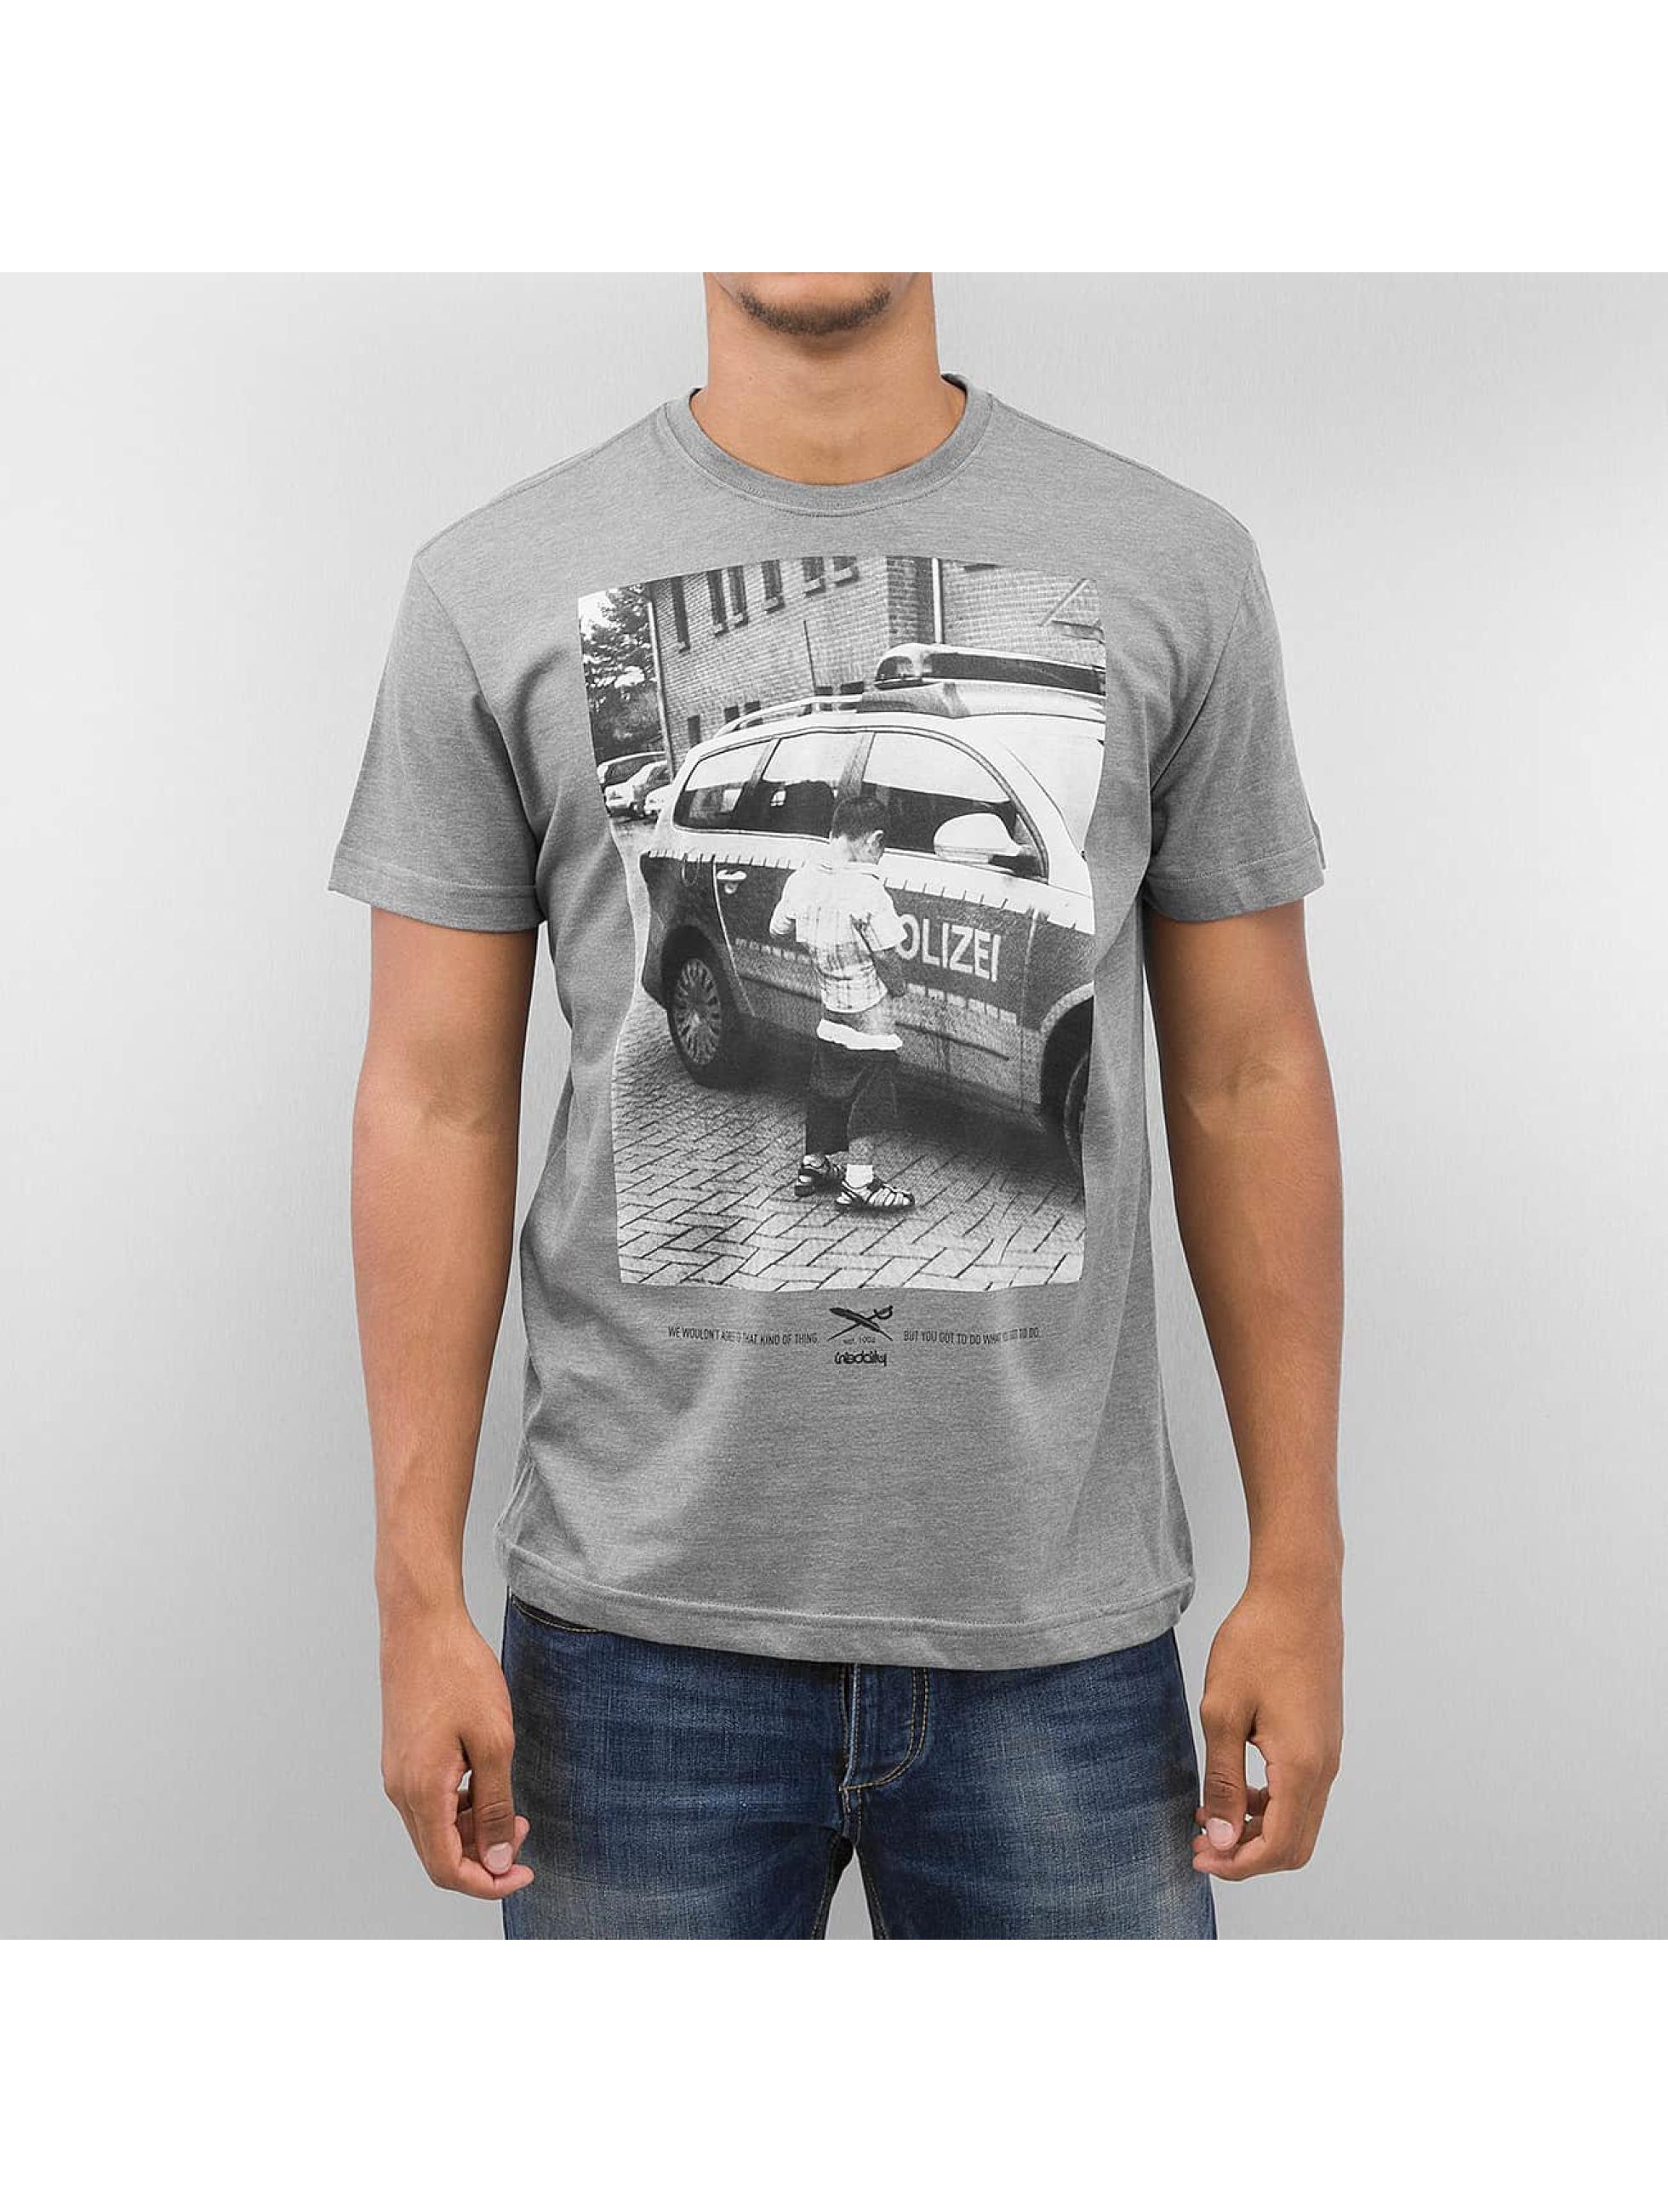 Iriedaily T-Shirt Pissizei grau